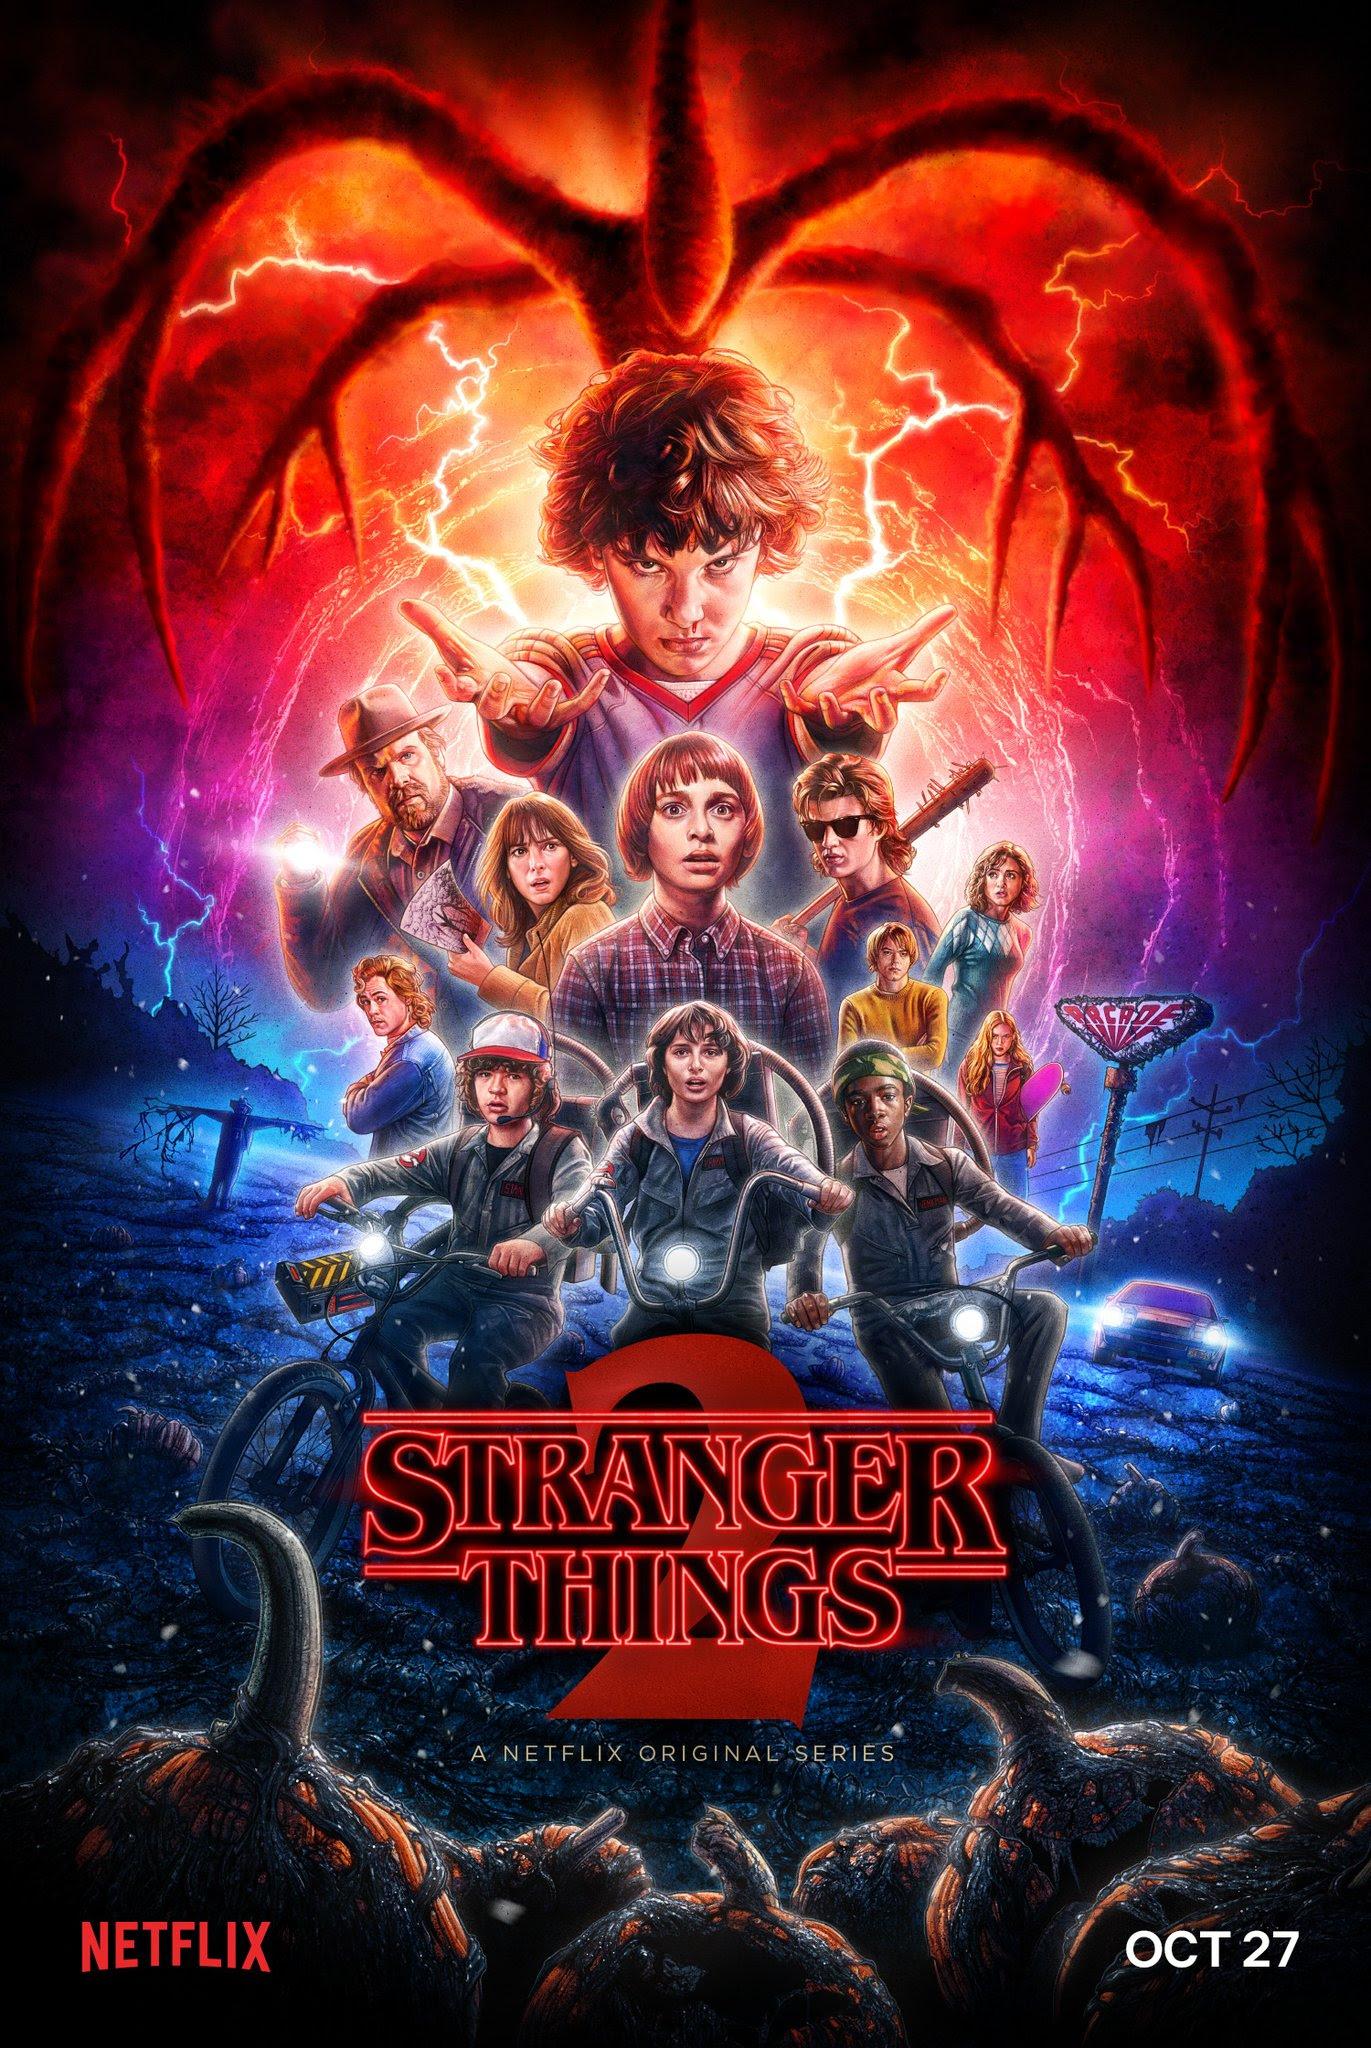 Resultado de imagem para Stranger Things season 2 posters